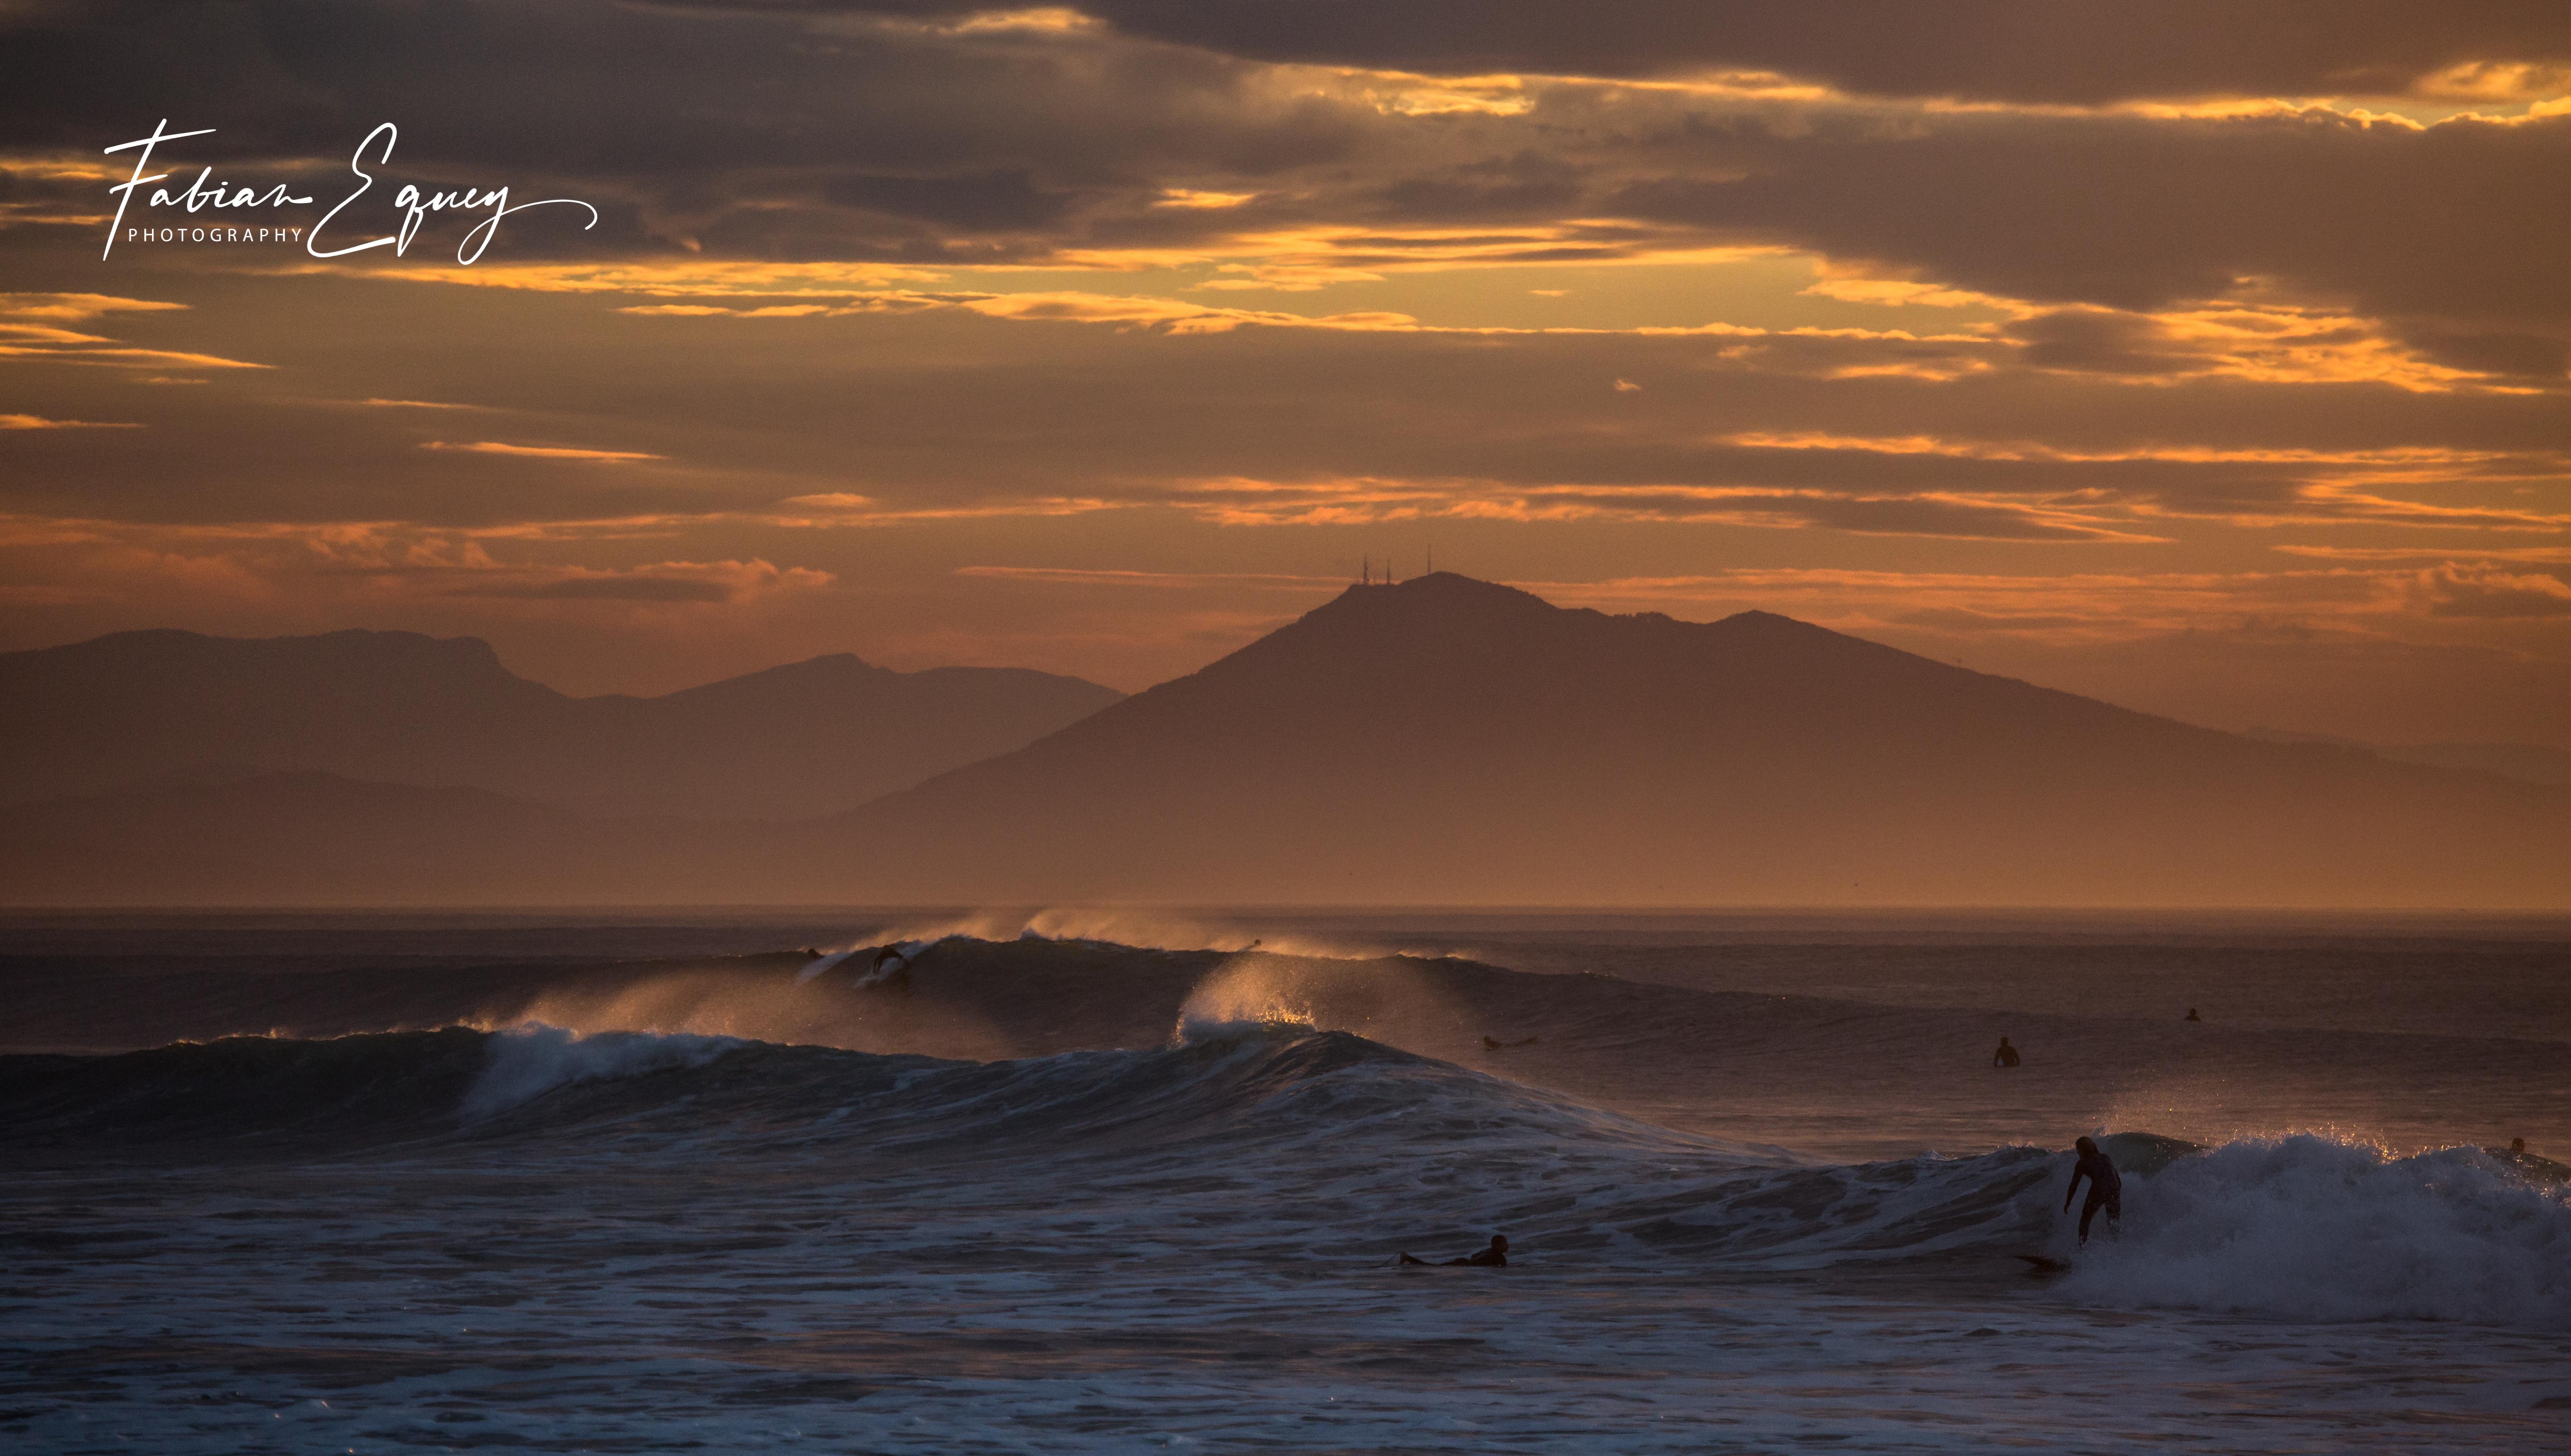 Surfing. Biarritz, France